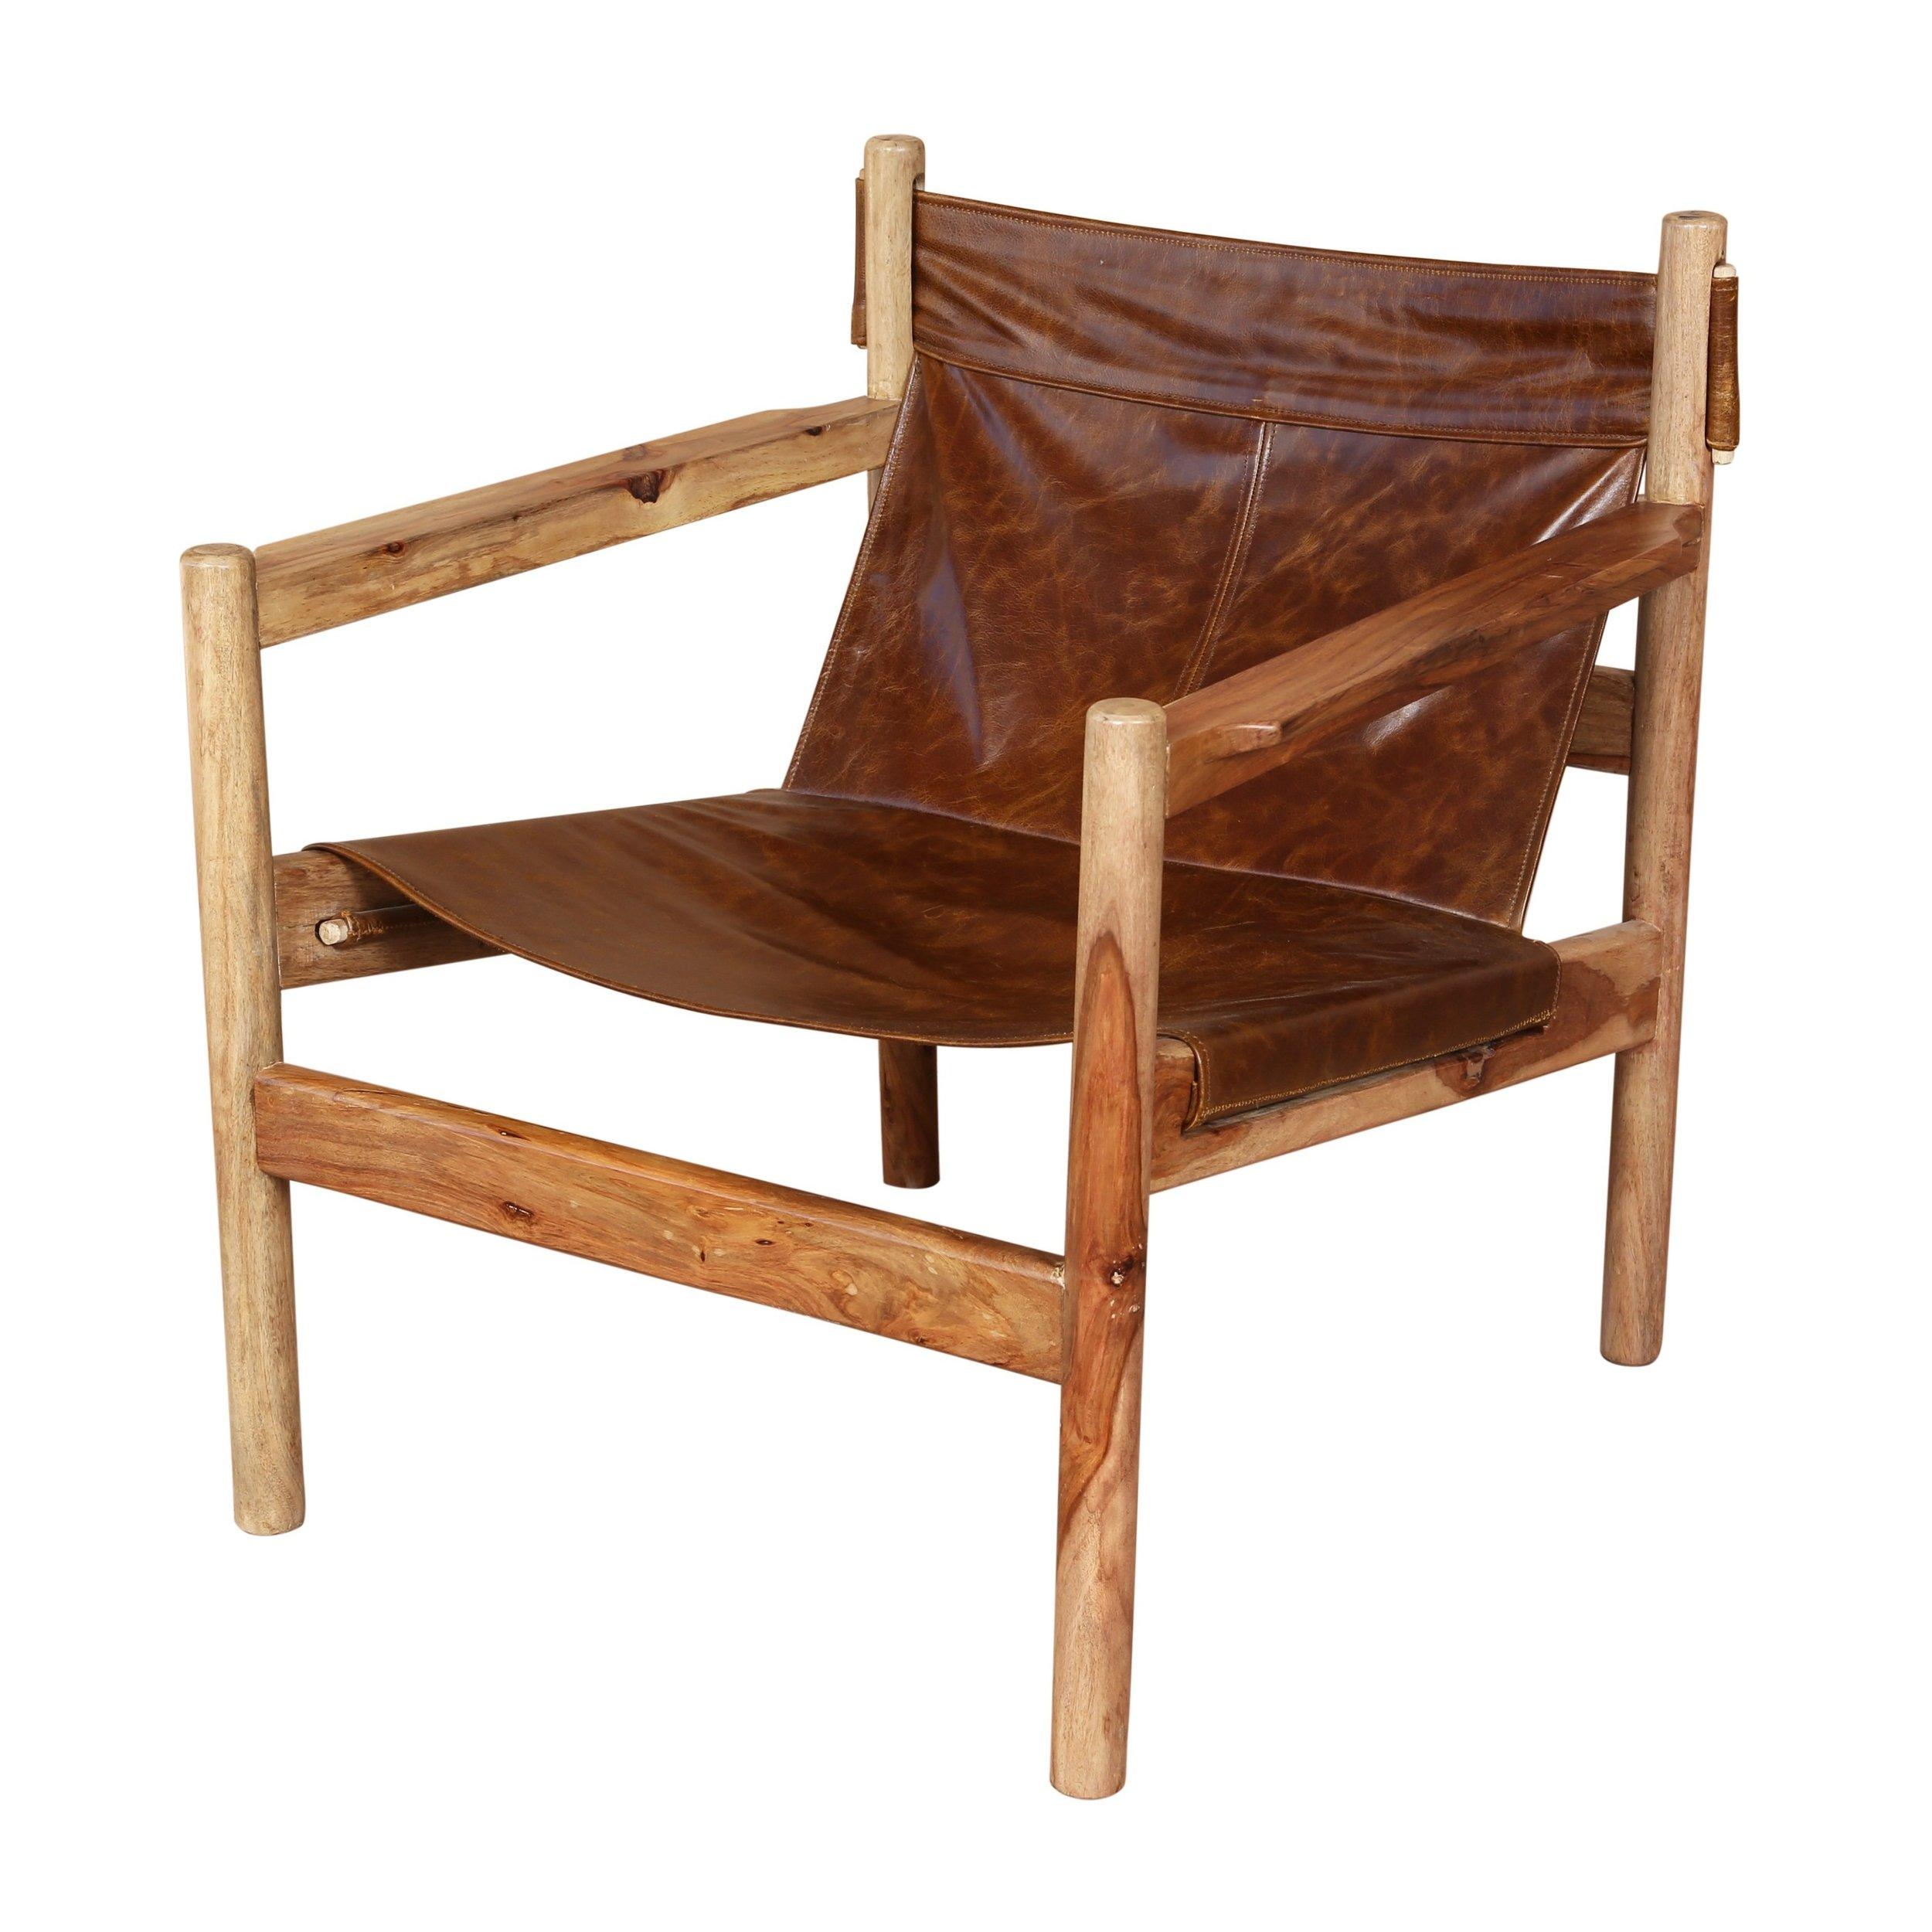 Porter-Genoa-Solid-Sheesham-and-Leather-Sling-Chair-India-2e3ae5c6-4e5b-4602-b3a1-06a37d18052b.jpg